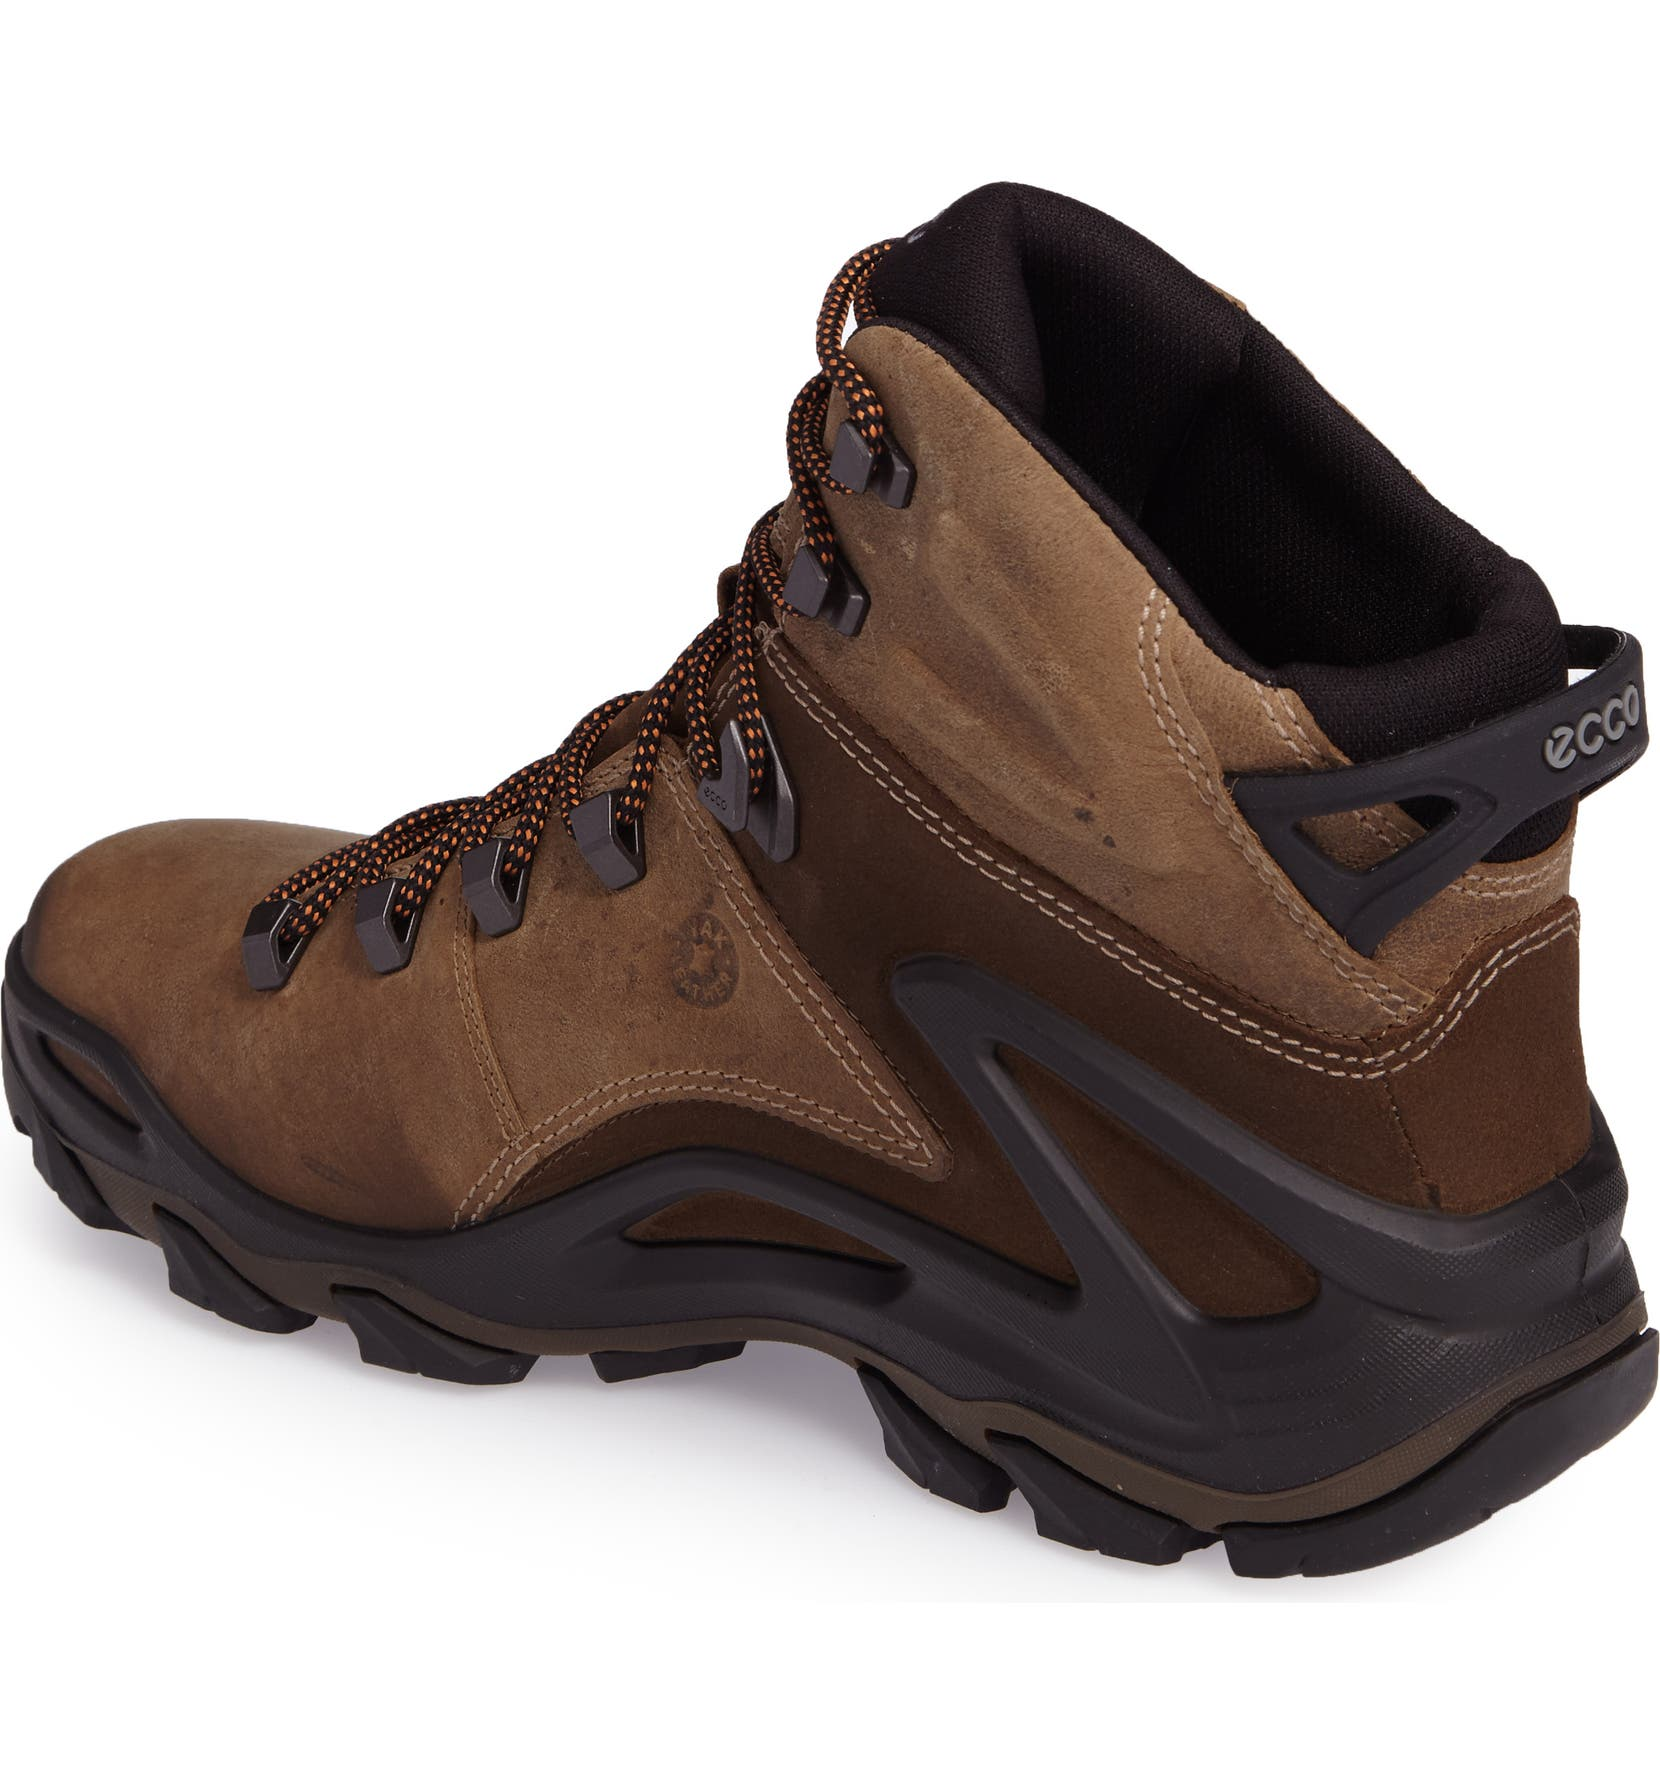 9973722cc4 Terra Evo GTX Mid Hiking Waterproof Boot